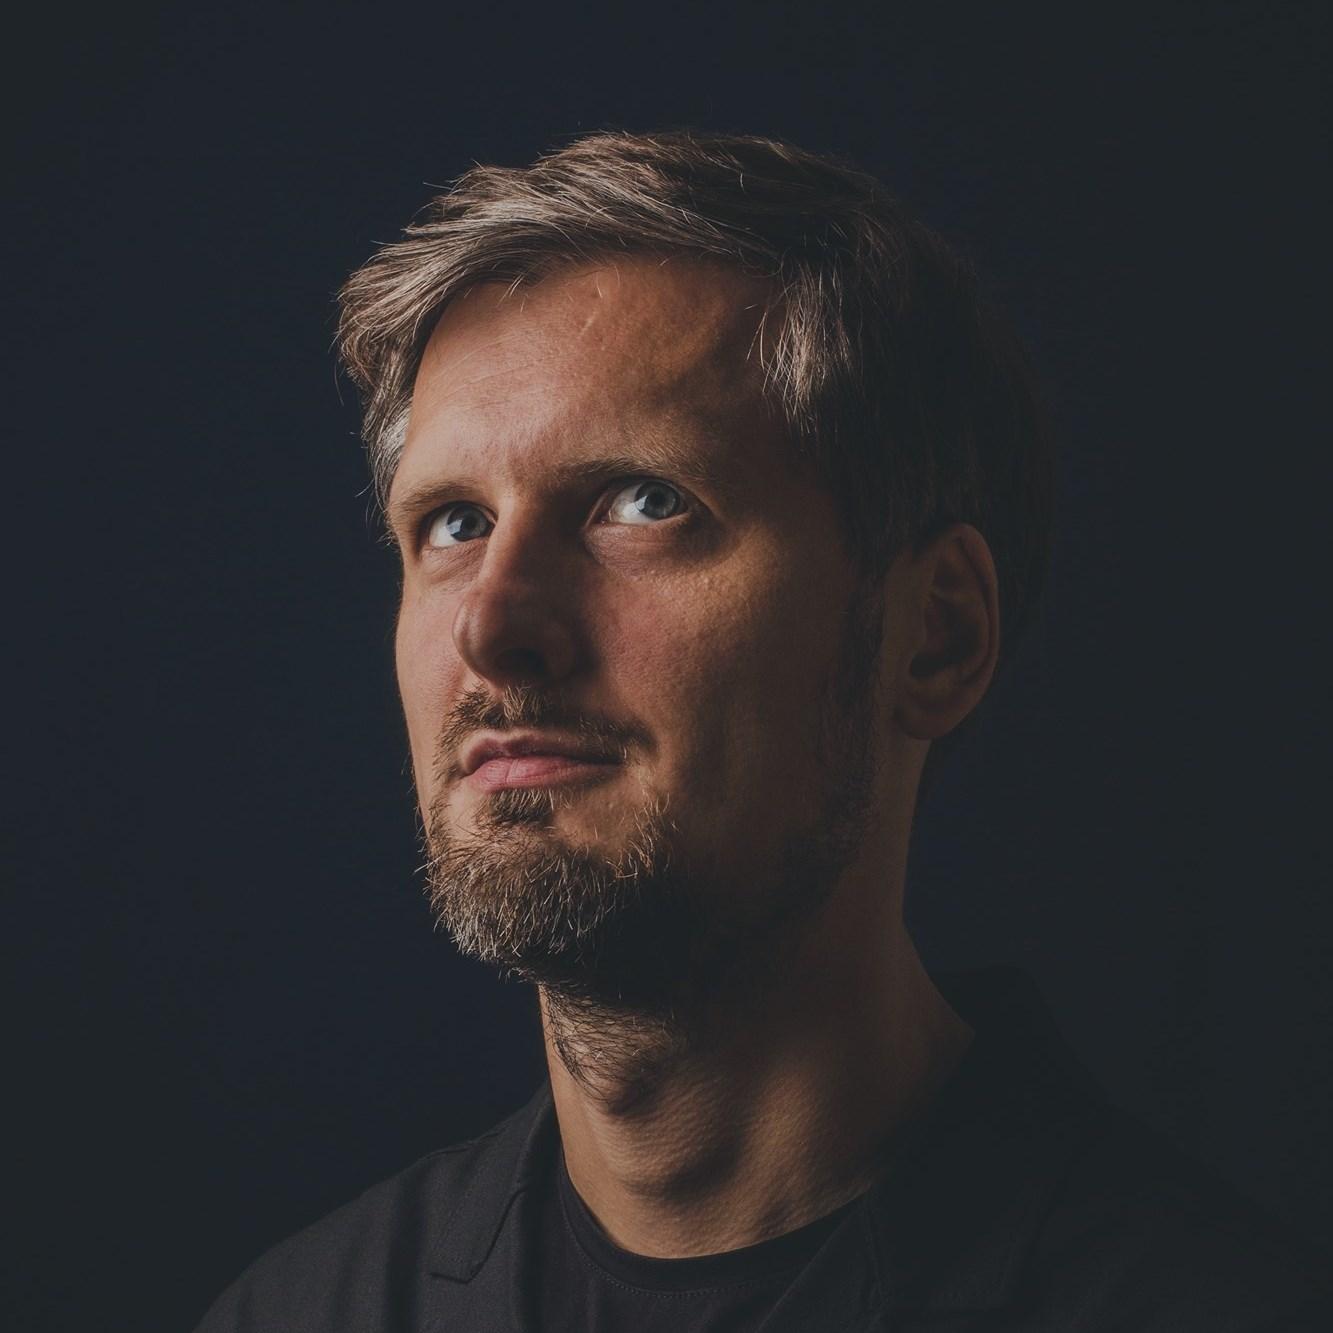 Tomek Kuczma